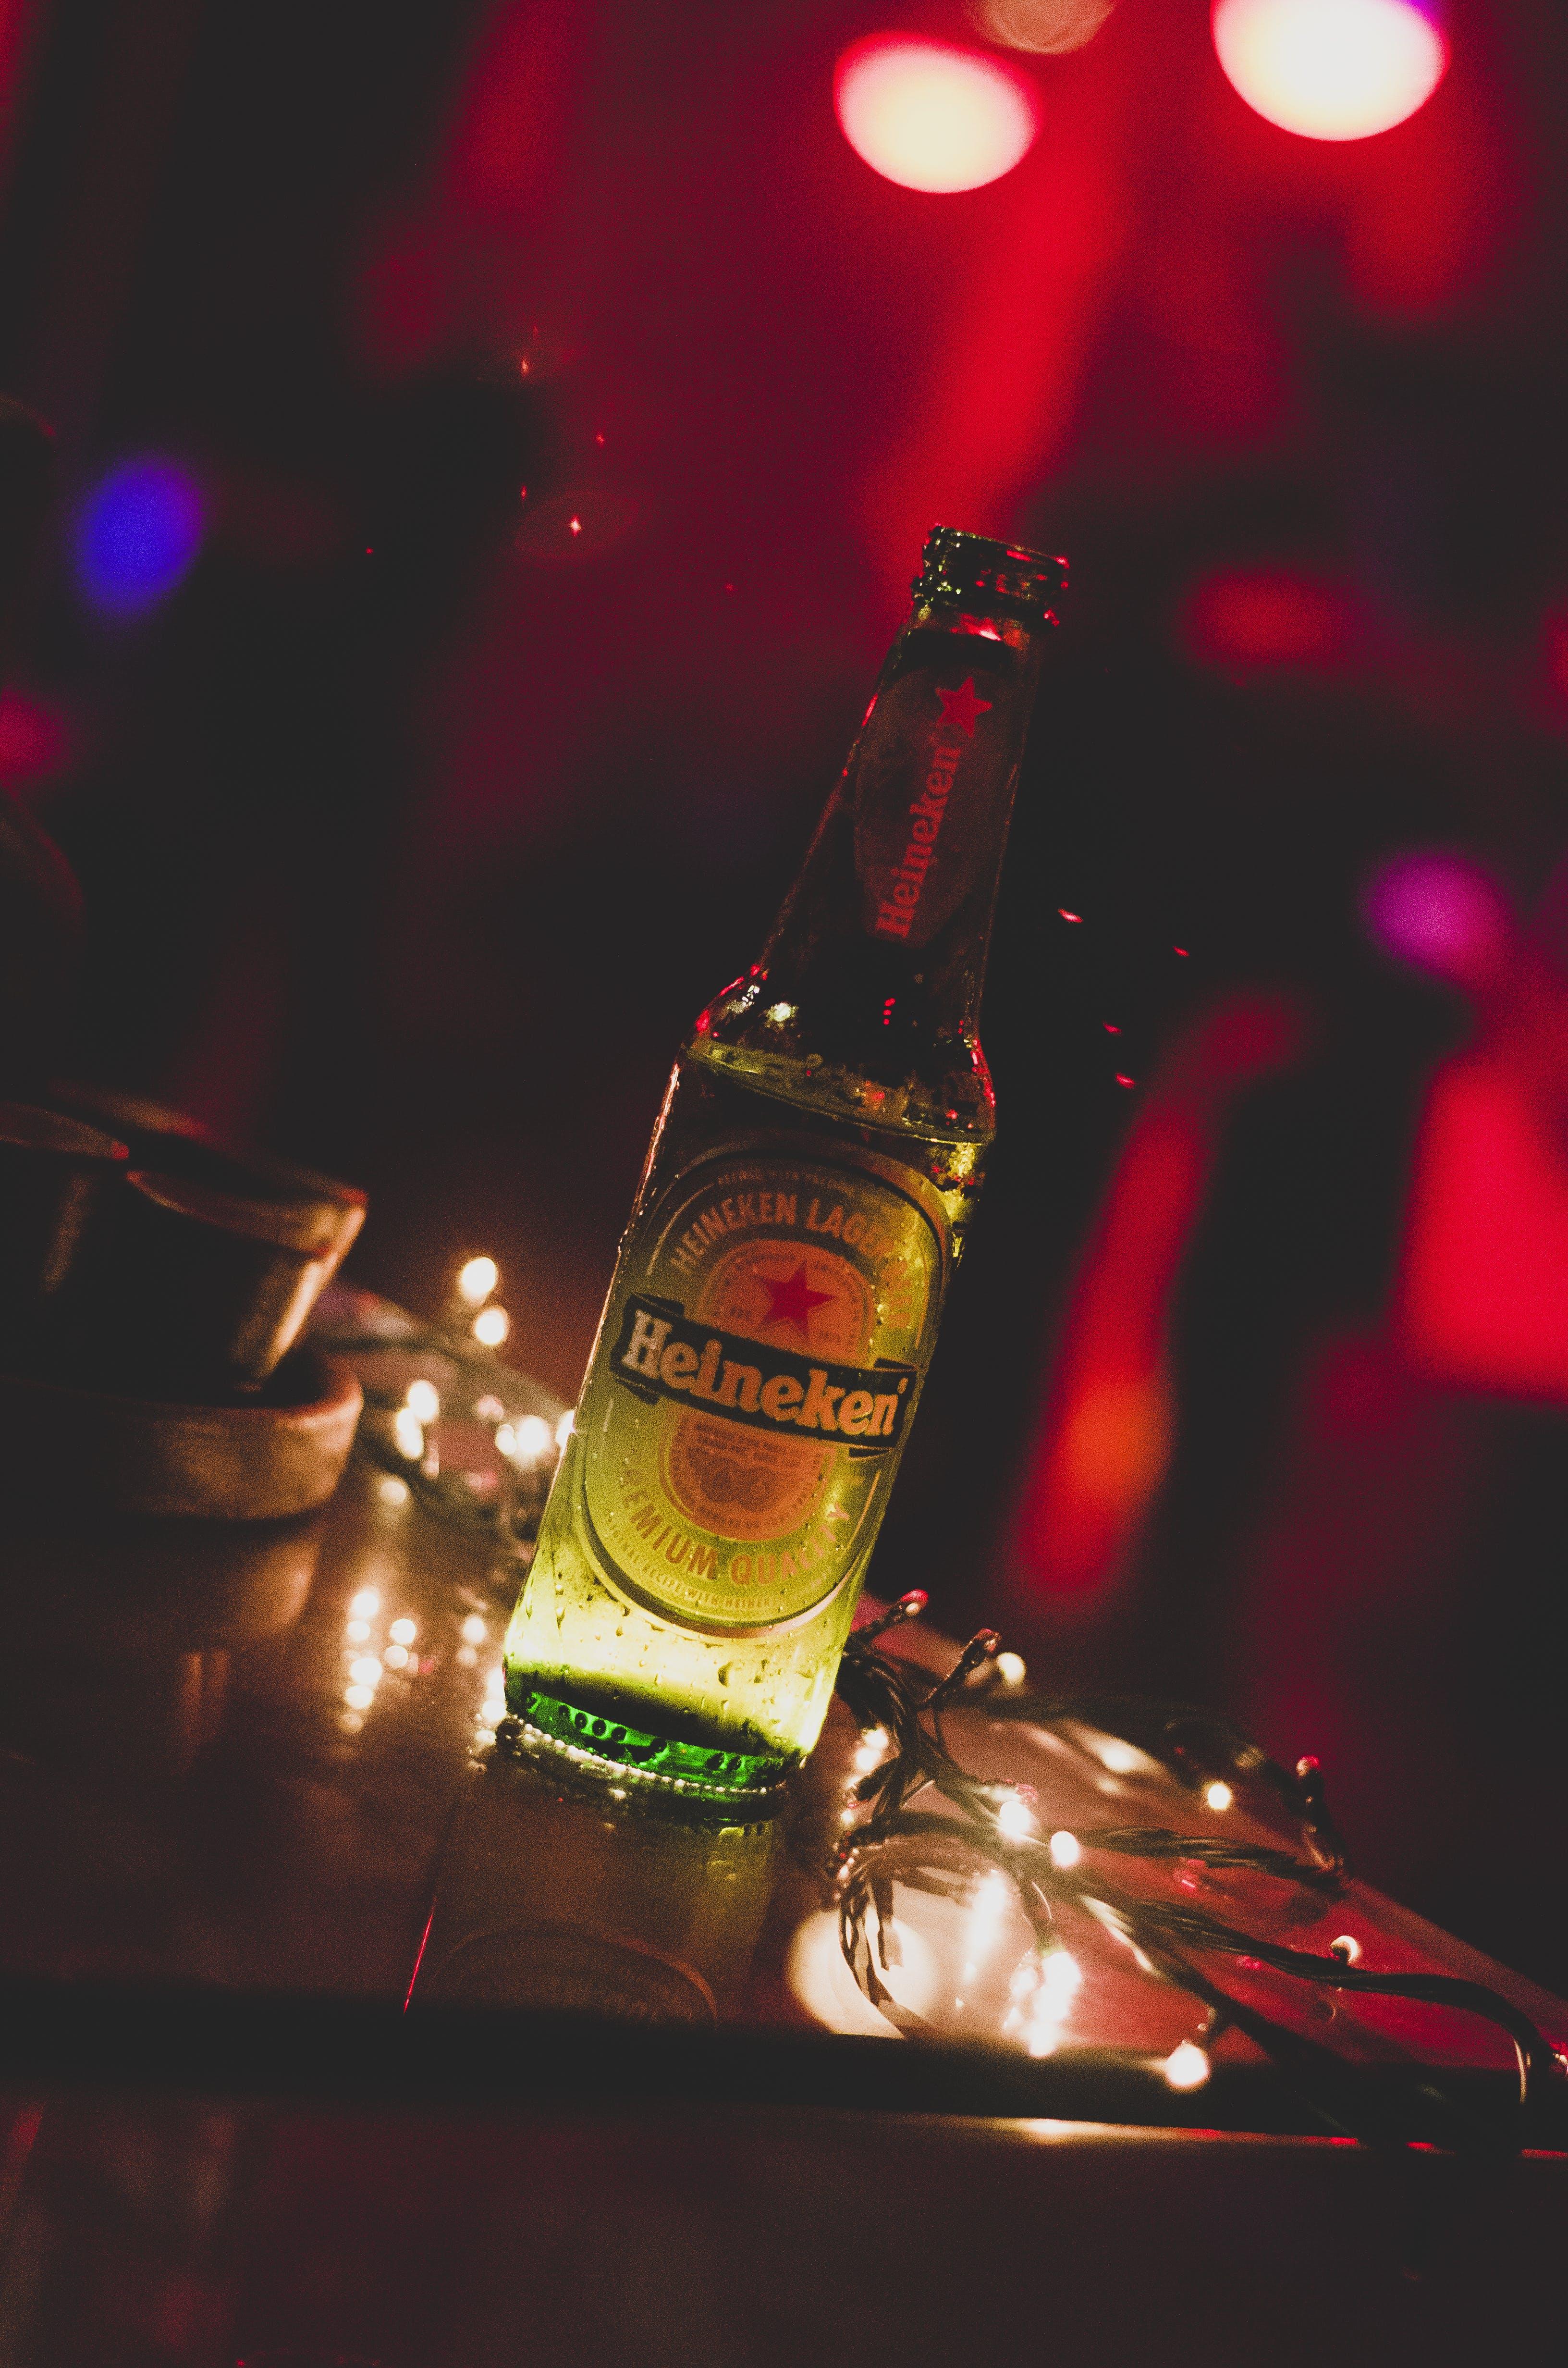 Close-Up Photo Of Heineken Bottle